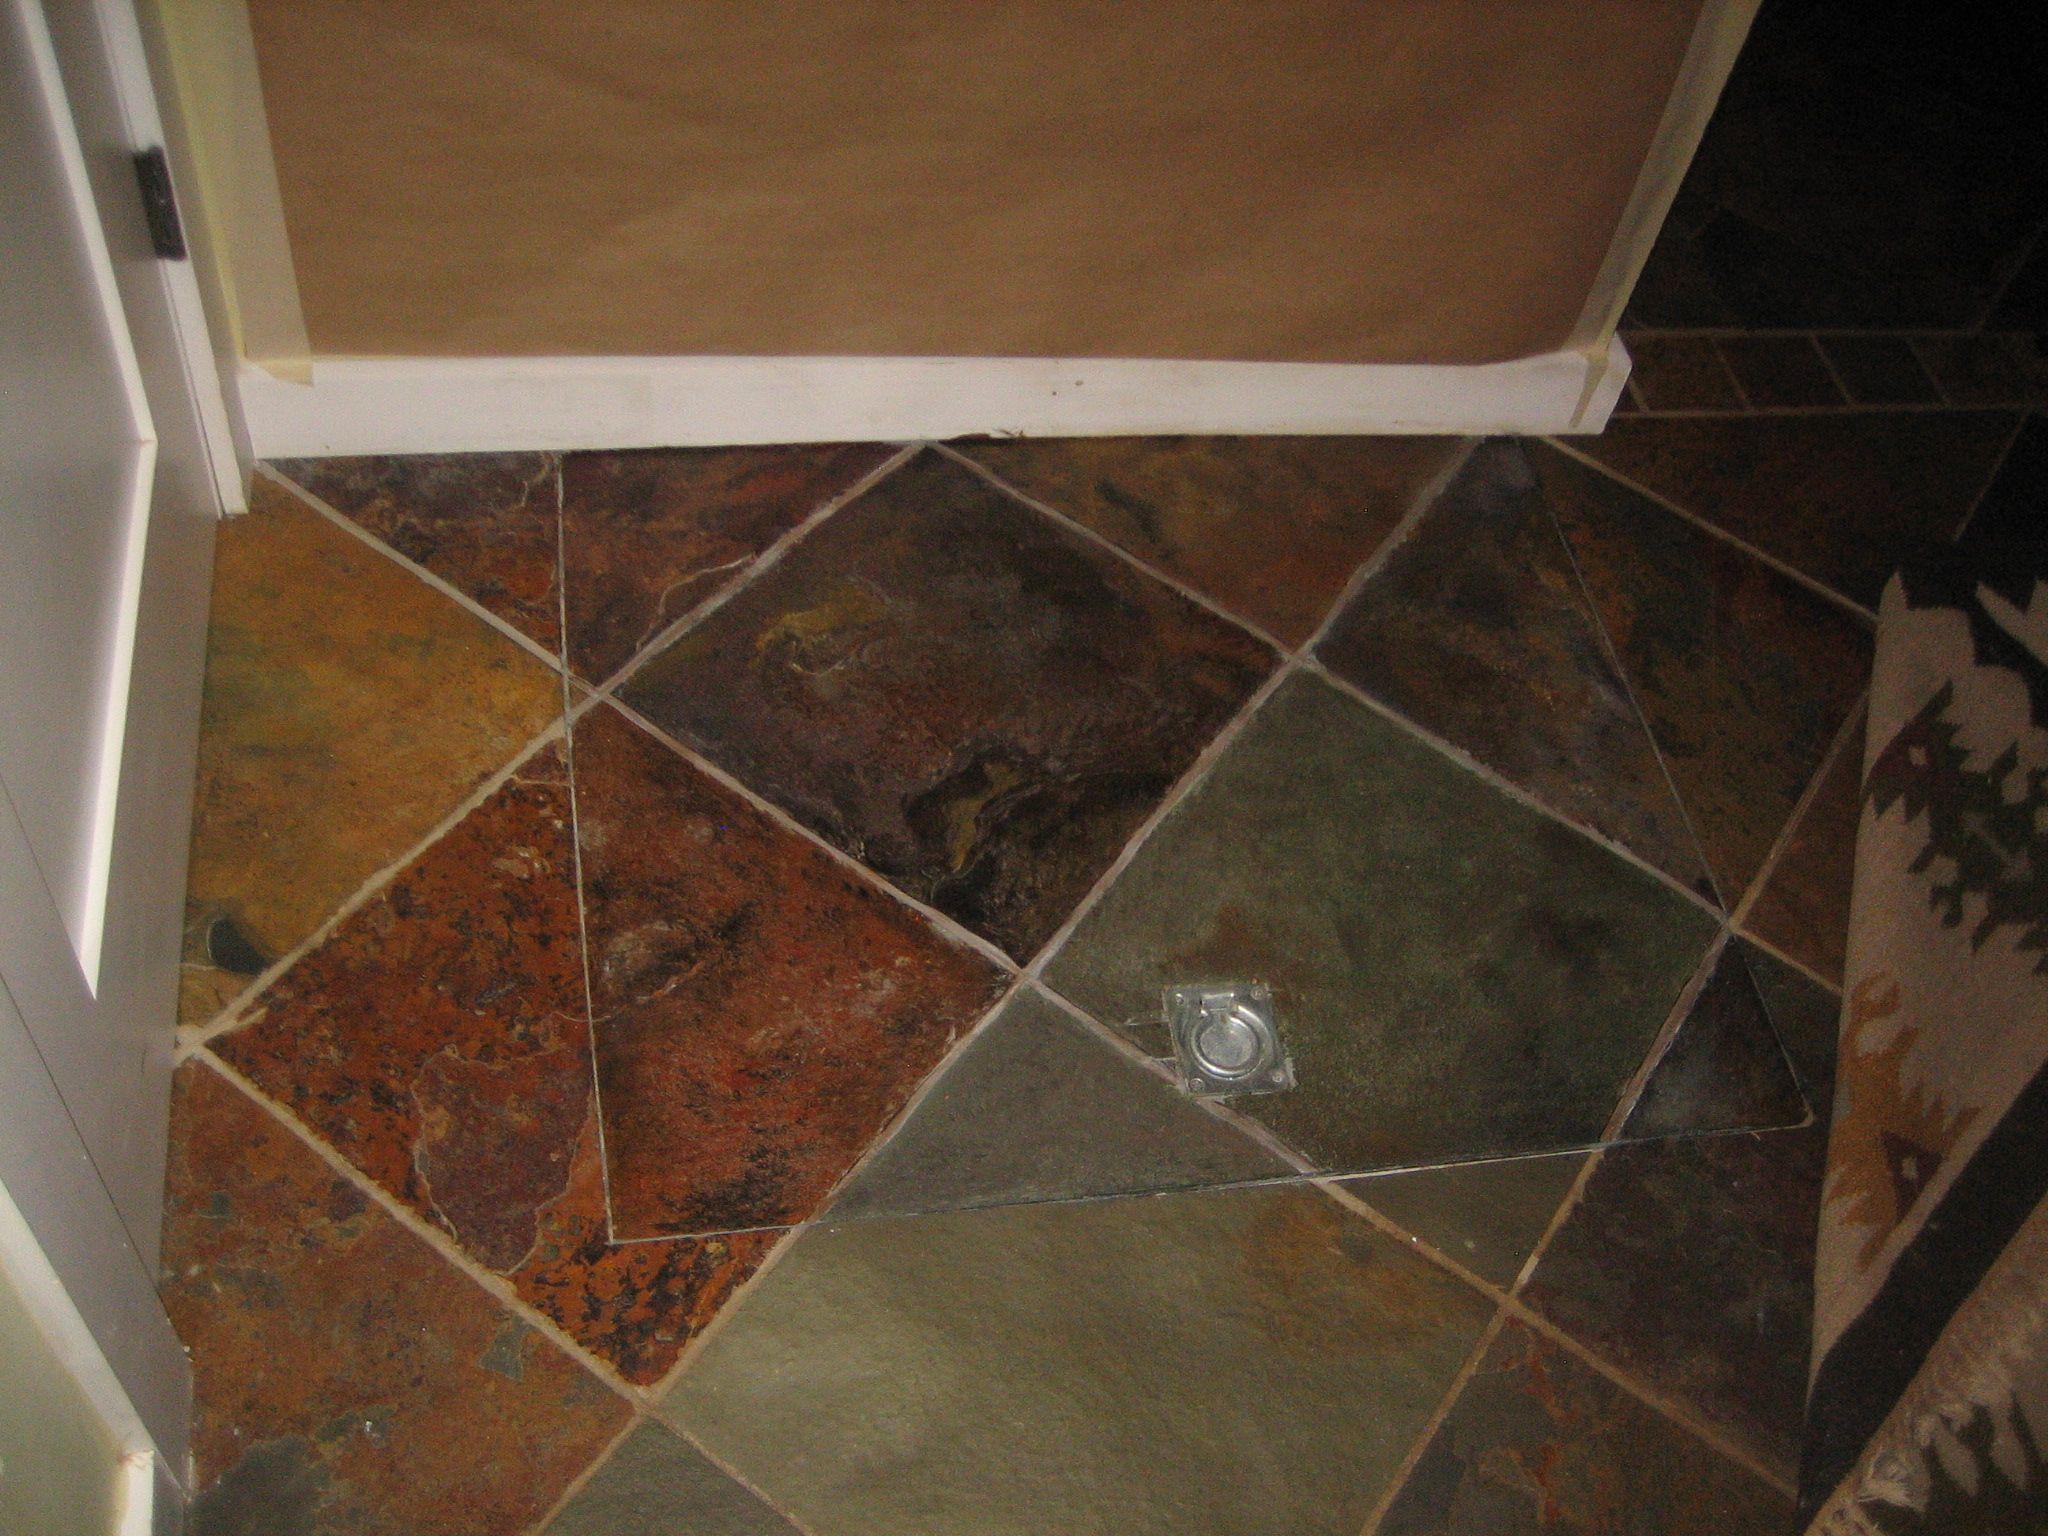 Pin By Shari Moraga On My Past Work Decorative Painting House Flooring Slate Flooring Painted Doors